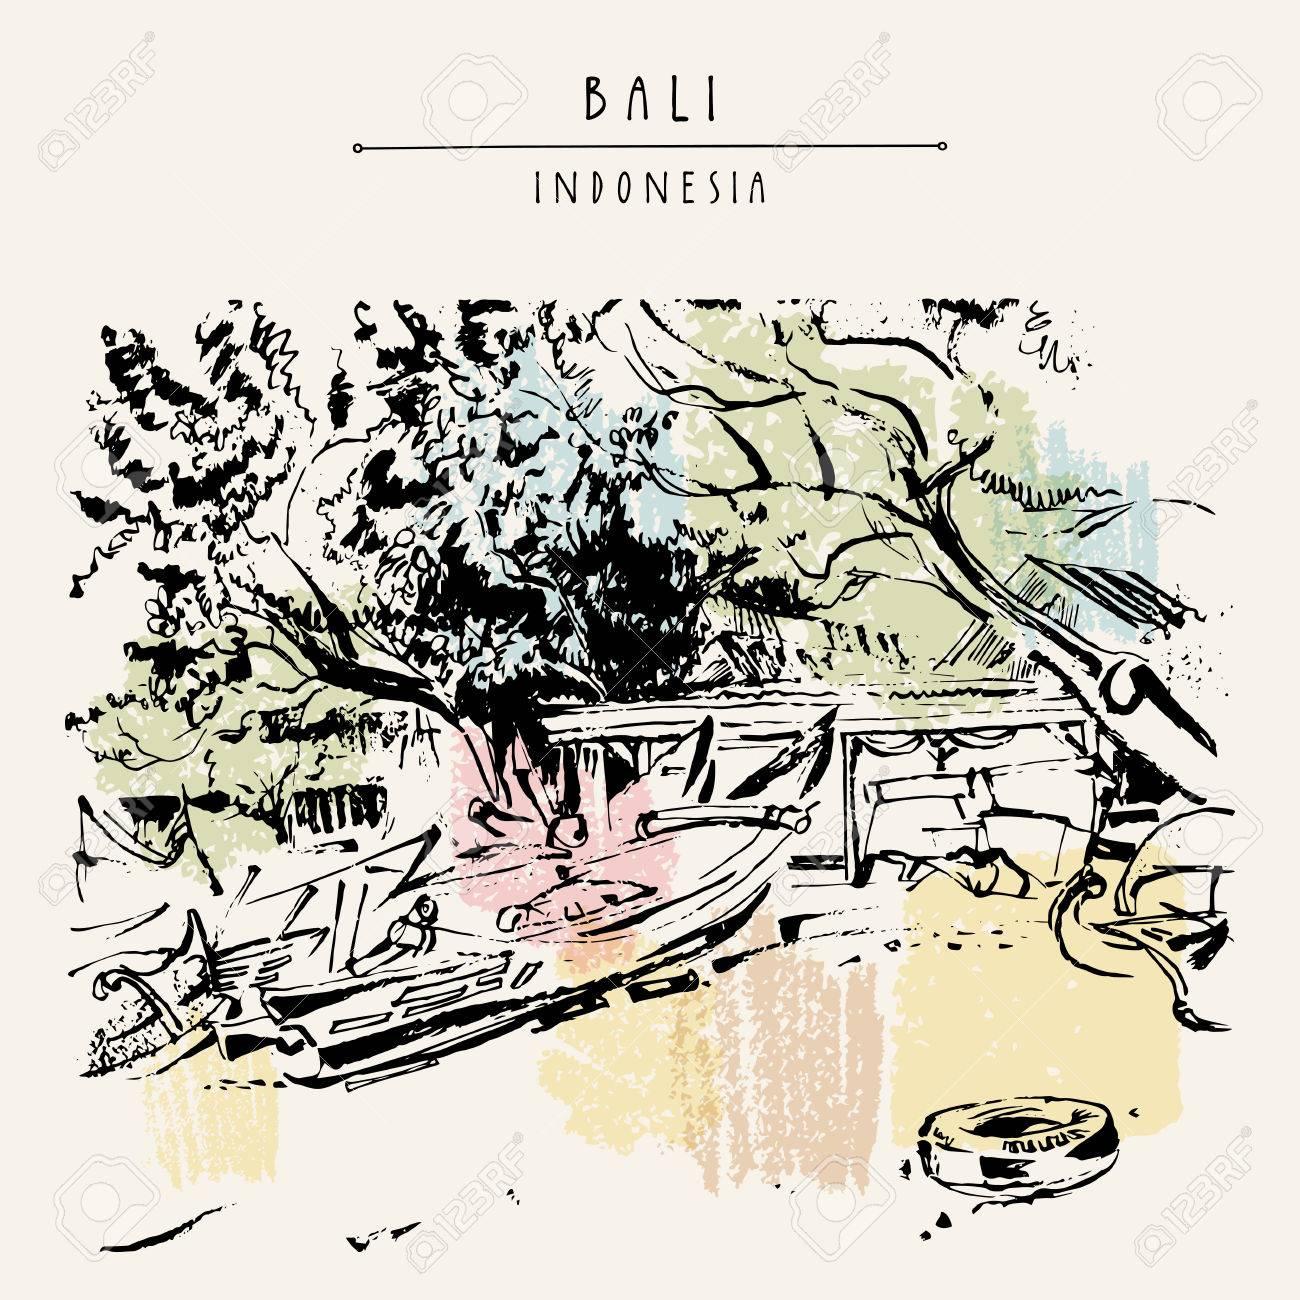 Jimbaran Bali Indonesie Plage Tropicale Sable Arbres Bateau De